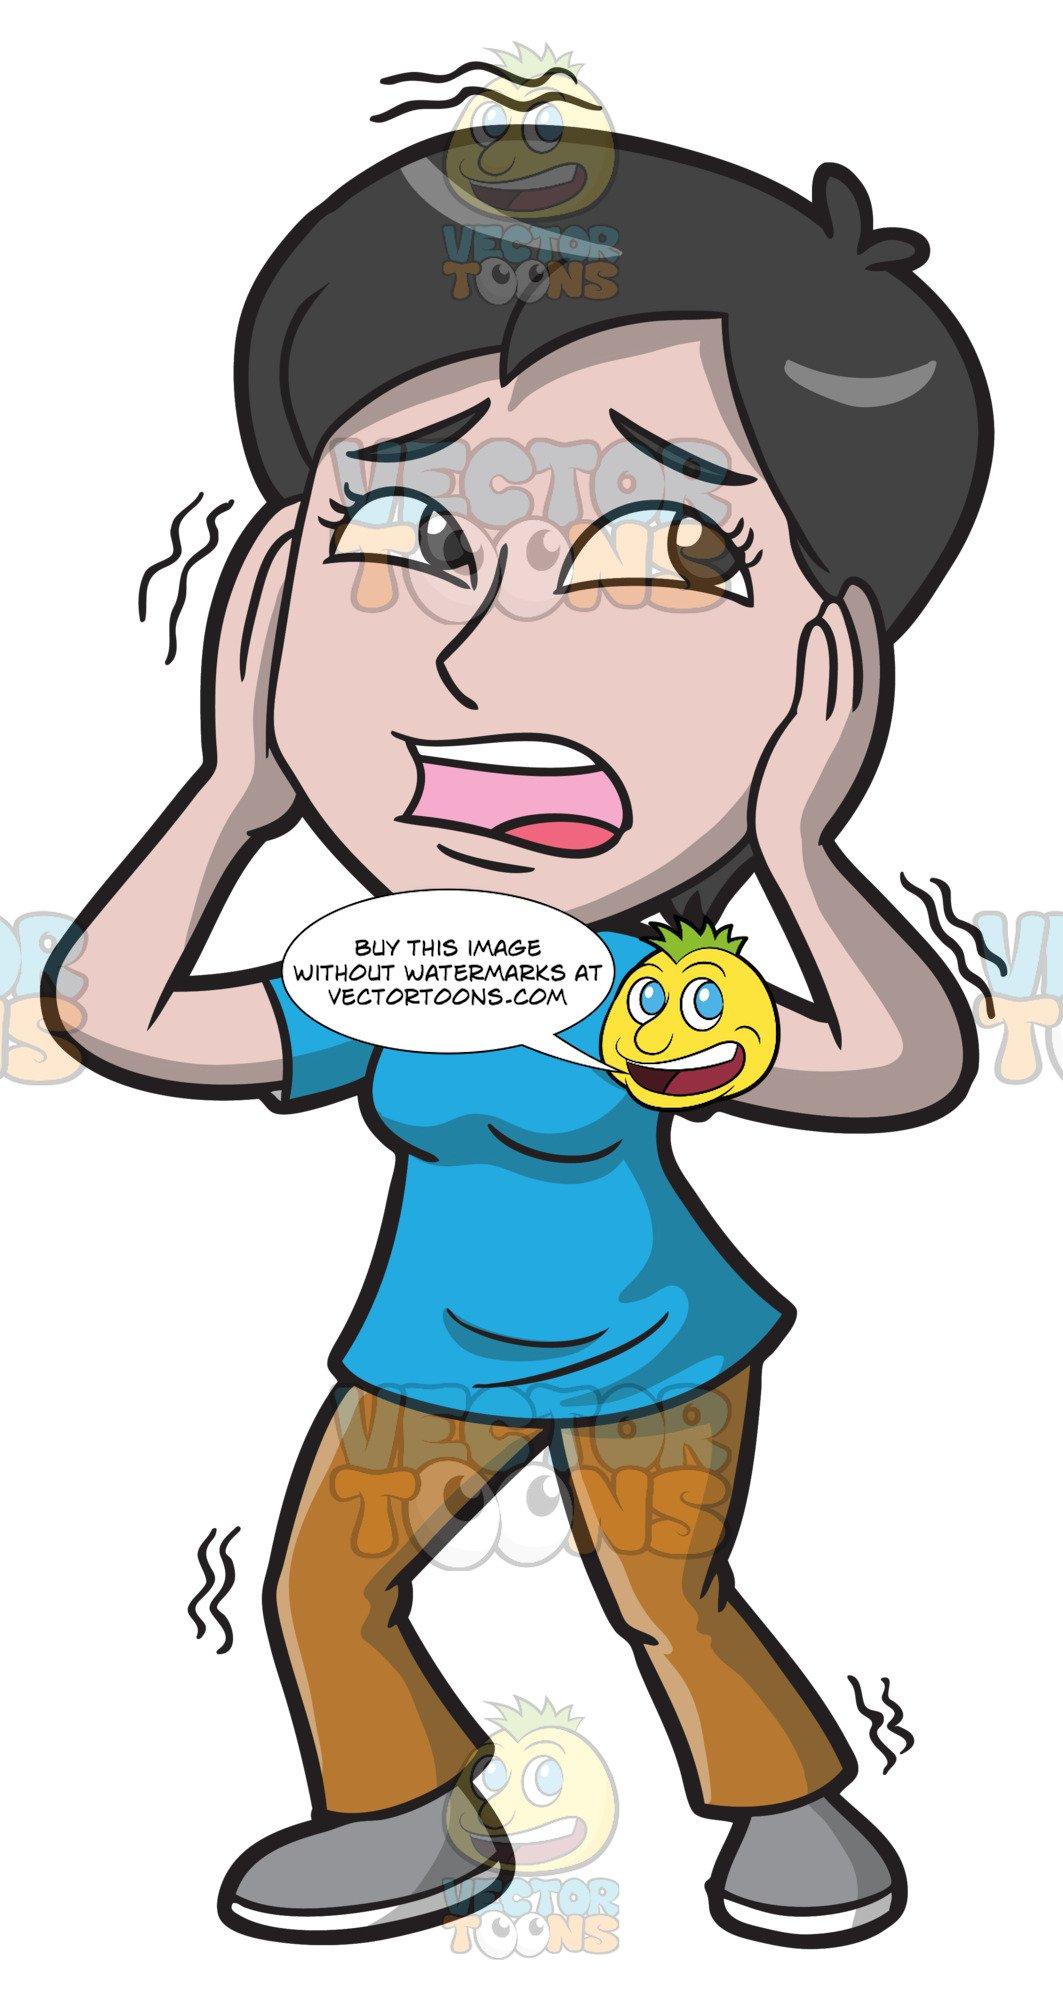 Nervous Child Cartoon Images, Stock Photos & Vectors   Shutterstock